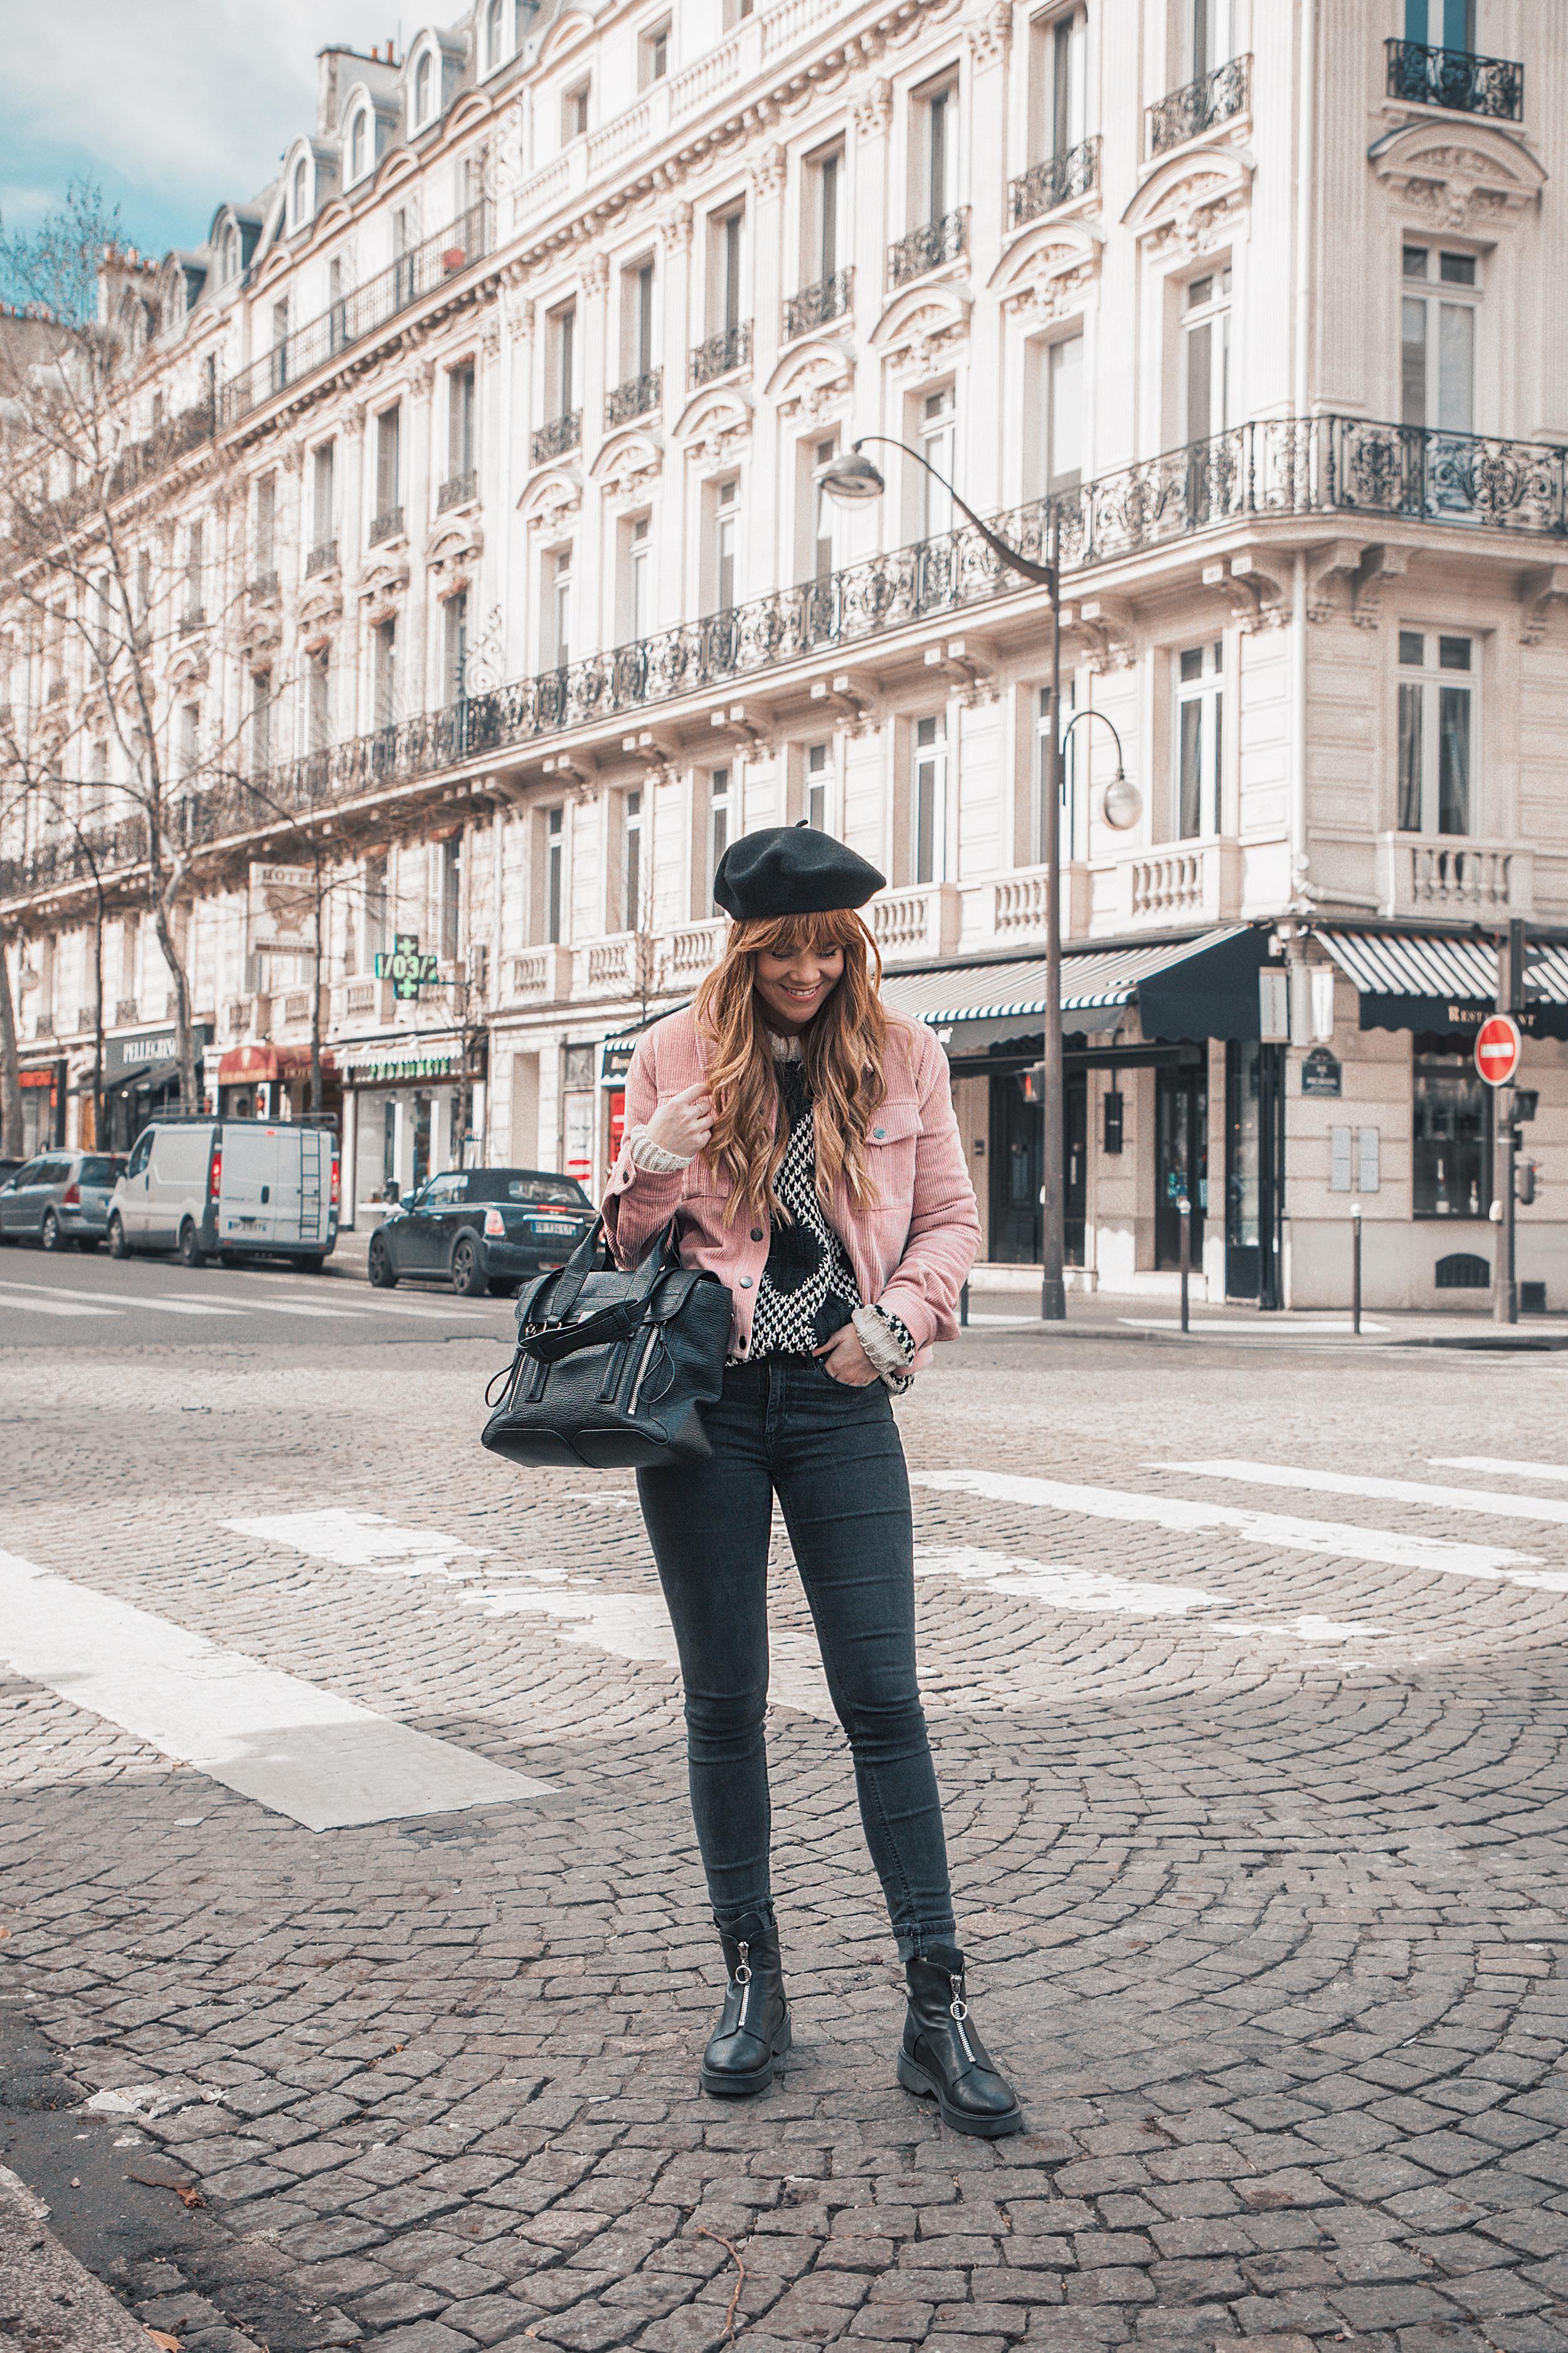 paris-winter-street-style-pink-jacket_1.jpg